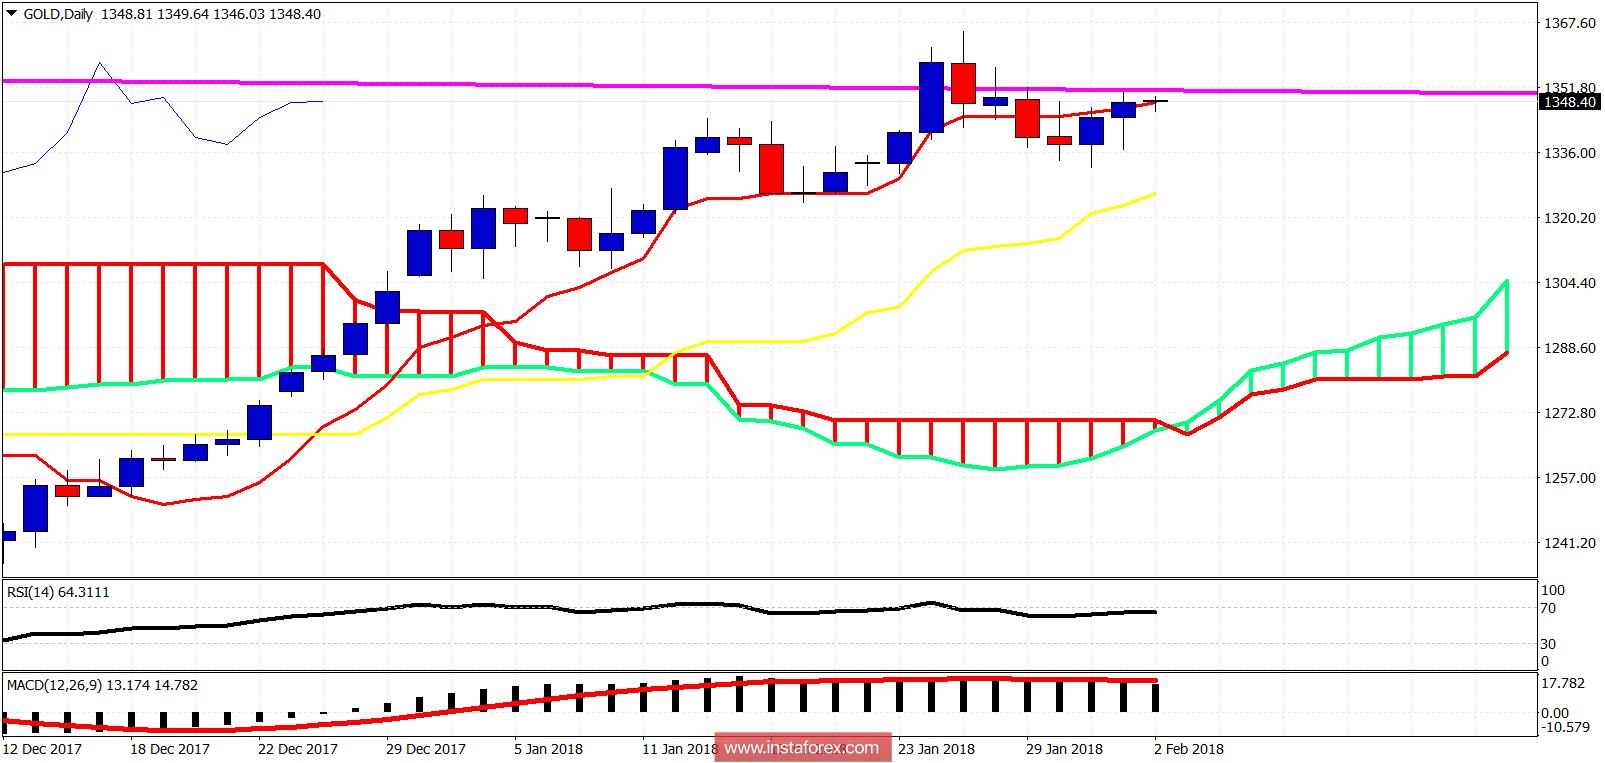 Ichimoku cloud indicator analysis of Gold for February 2, 2018